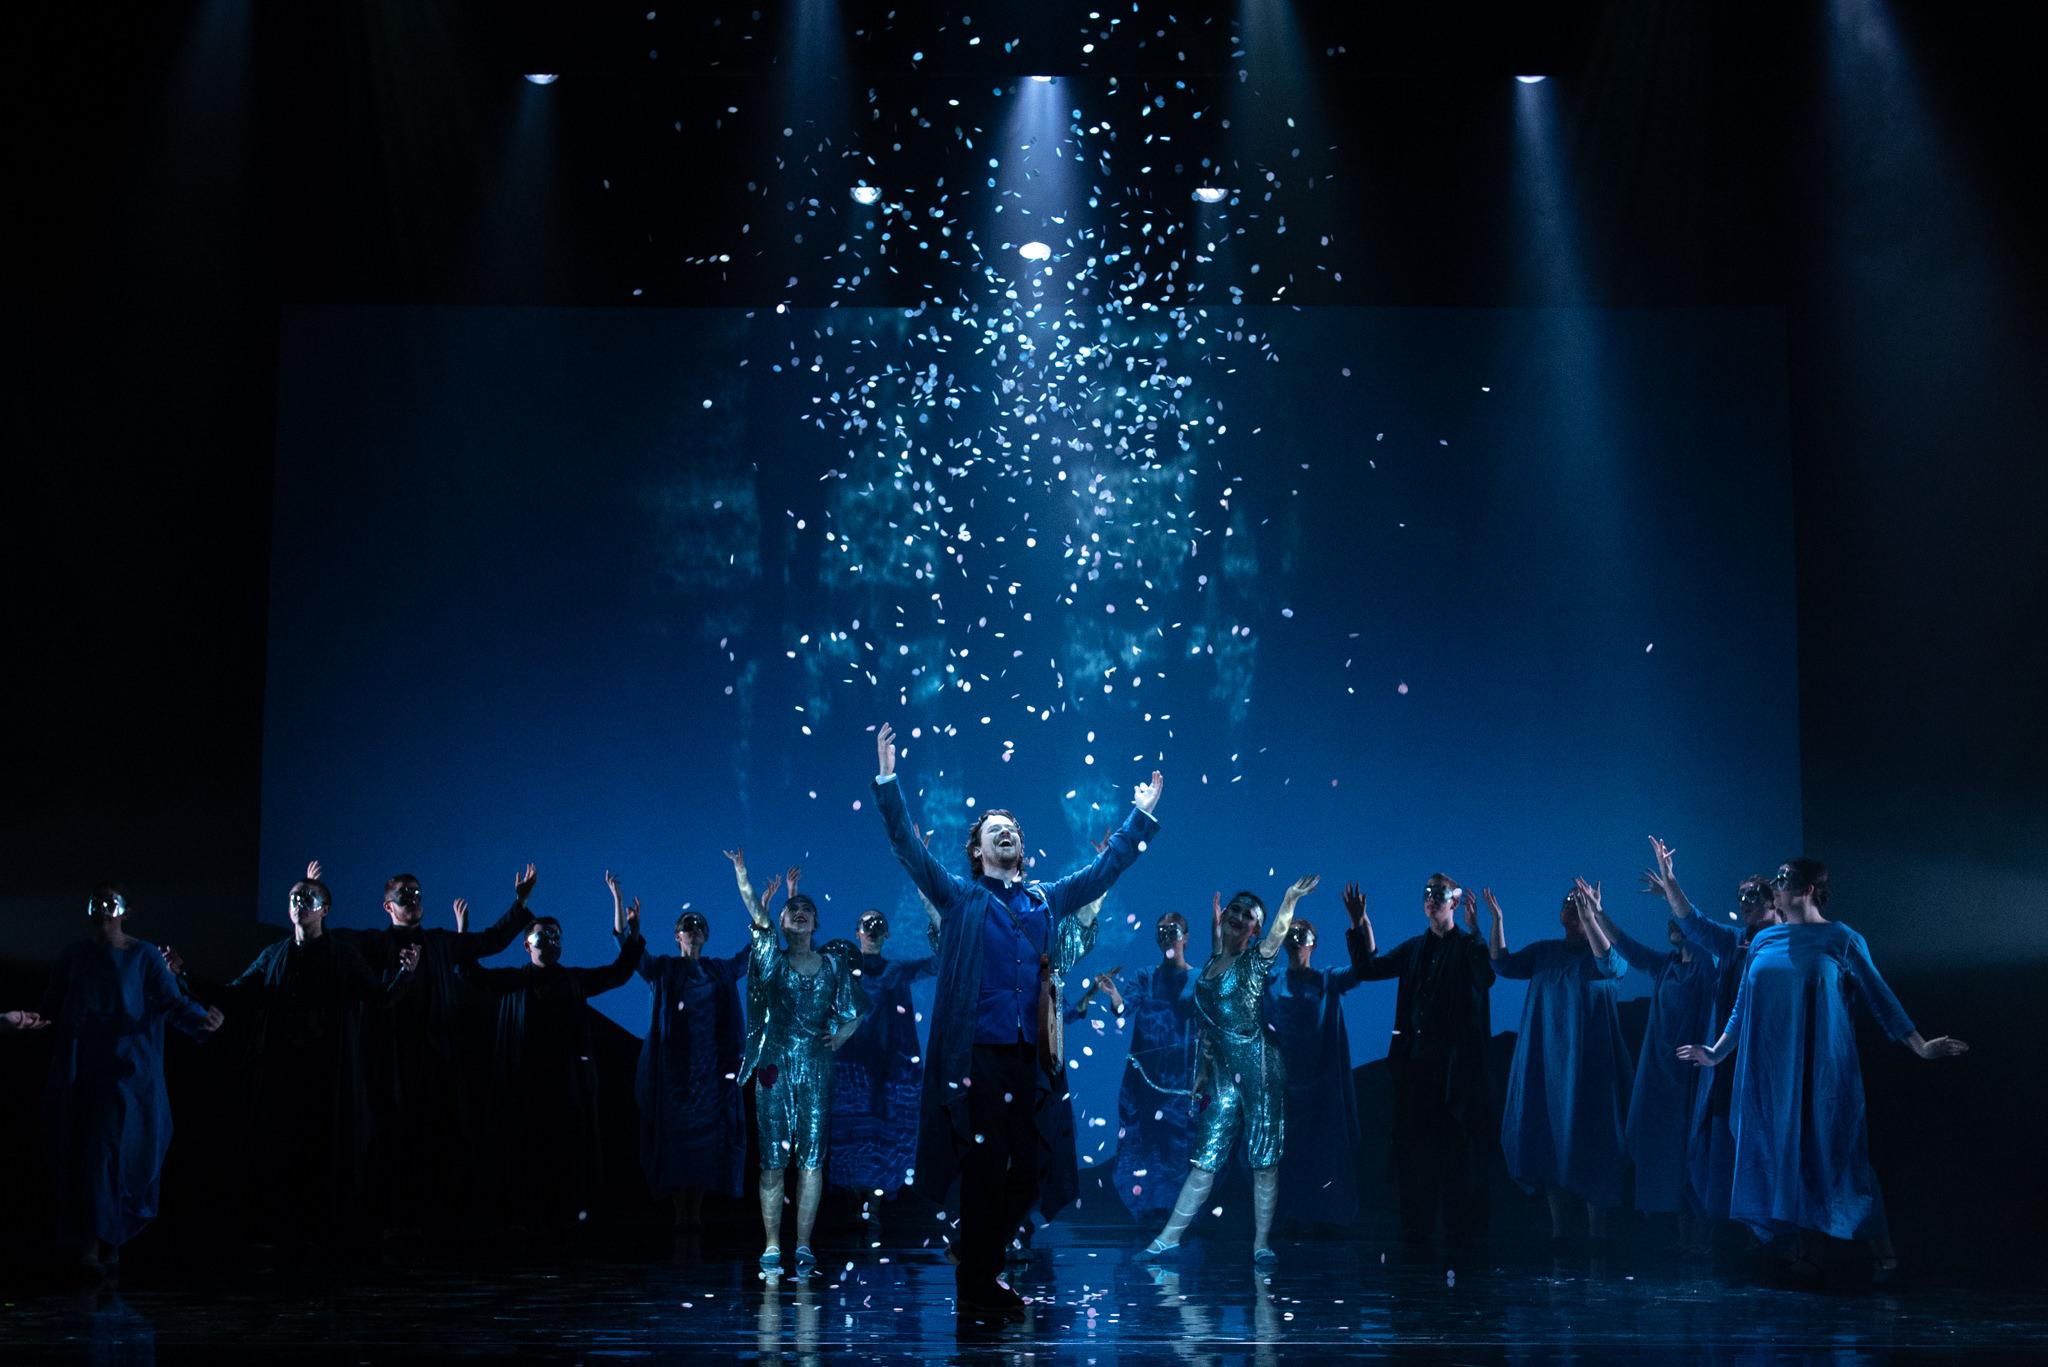 Scottish Opera - Orfeo & Euridice © Julie Broadfoot - www.juliebee.co.uk